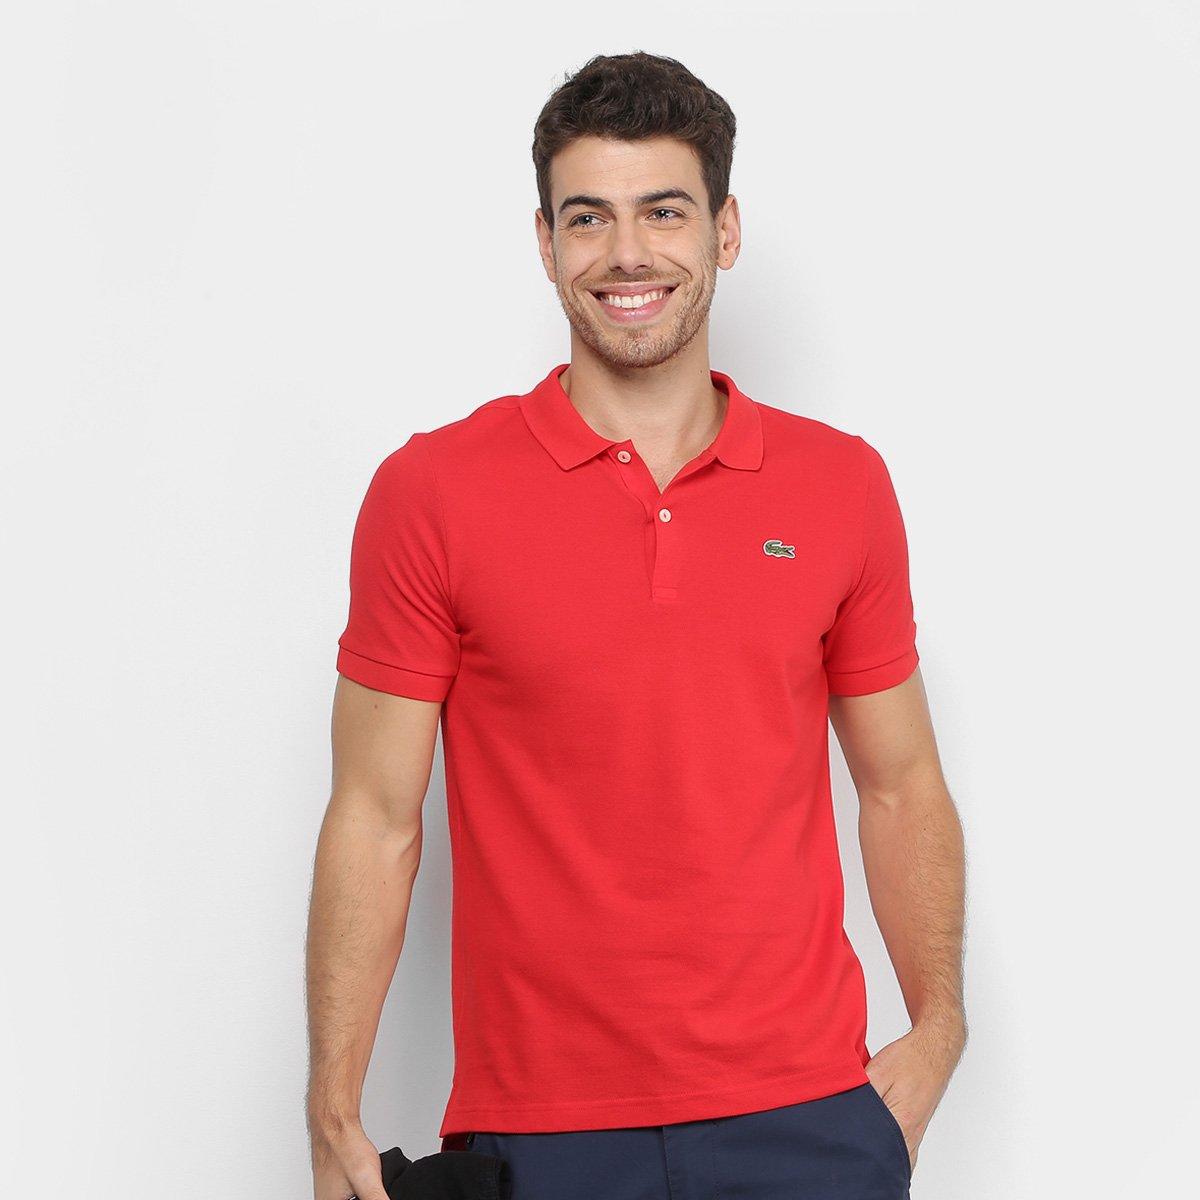 Camisa Polo Lacoste Live Piquet Masculina a090eb86e7a3c